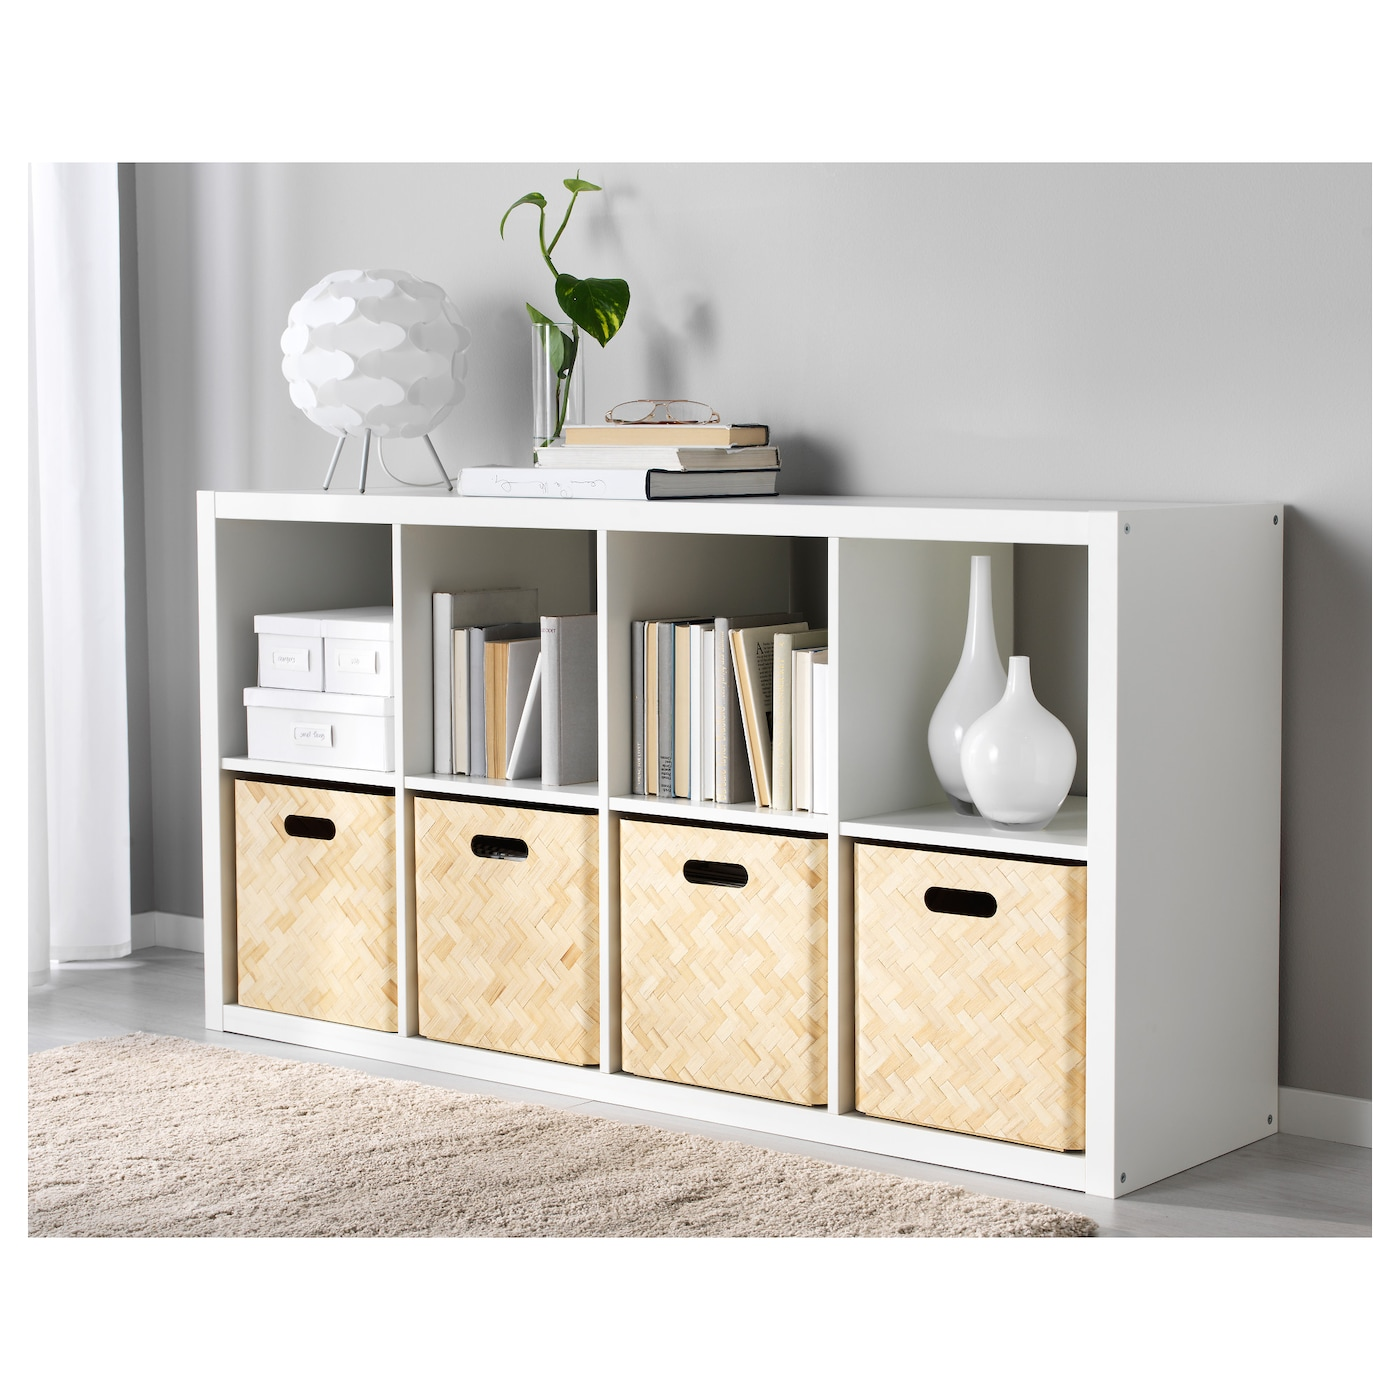 bullig box bamboo 32 x 35 x 33 cm ikea rh ikea com Wall Shelves DIY Shelves